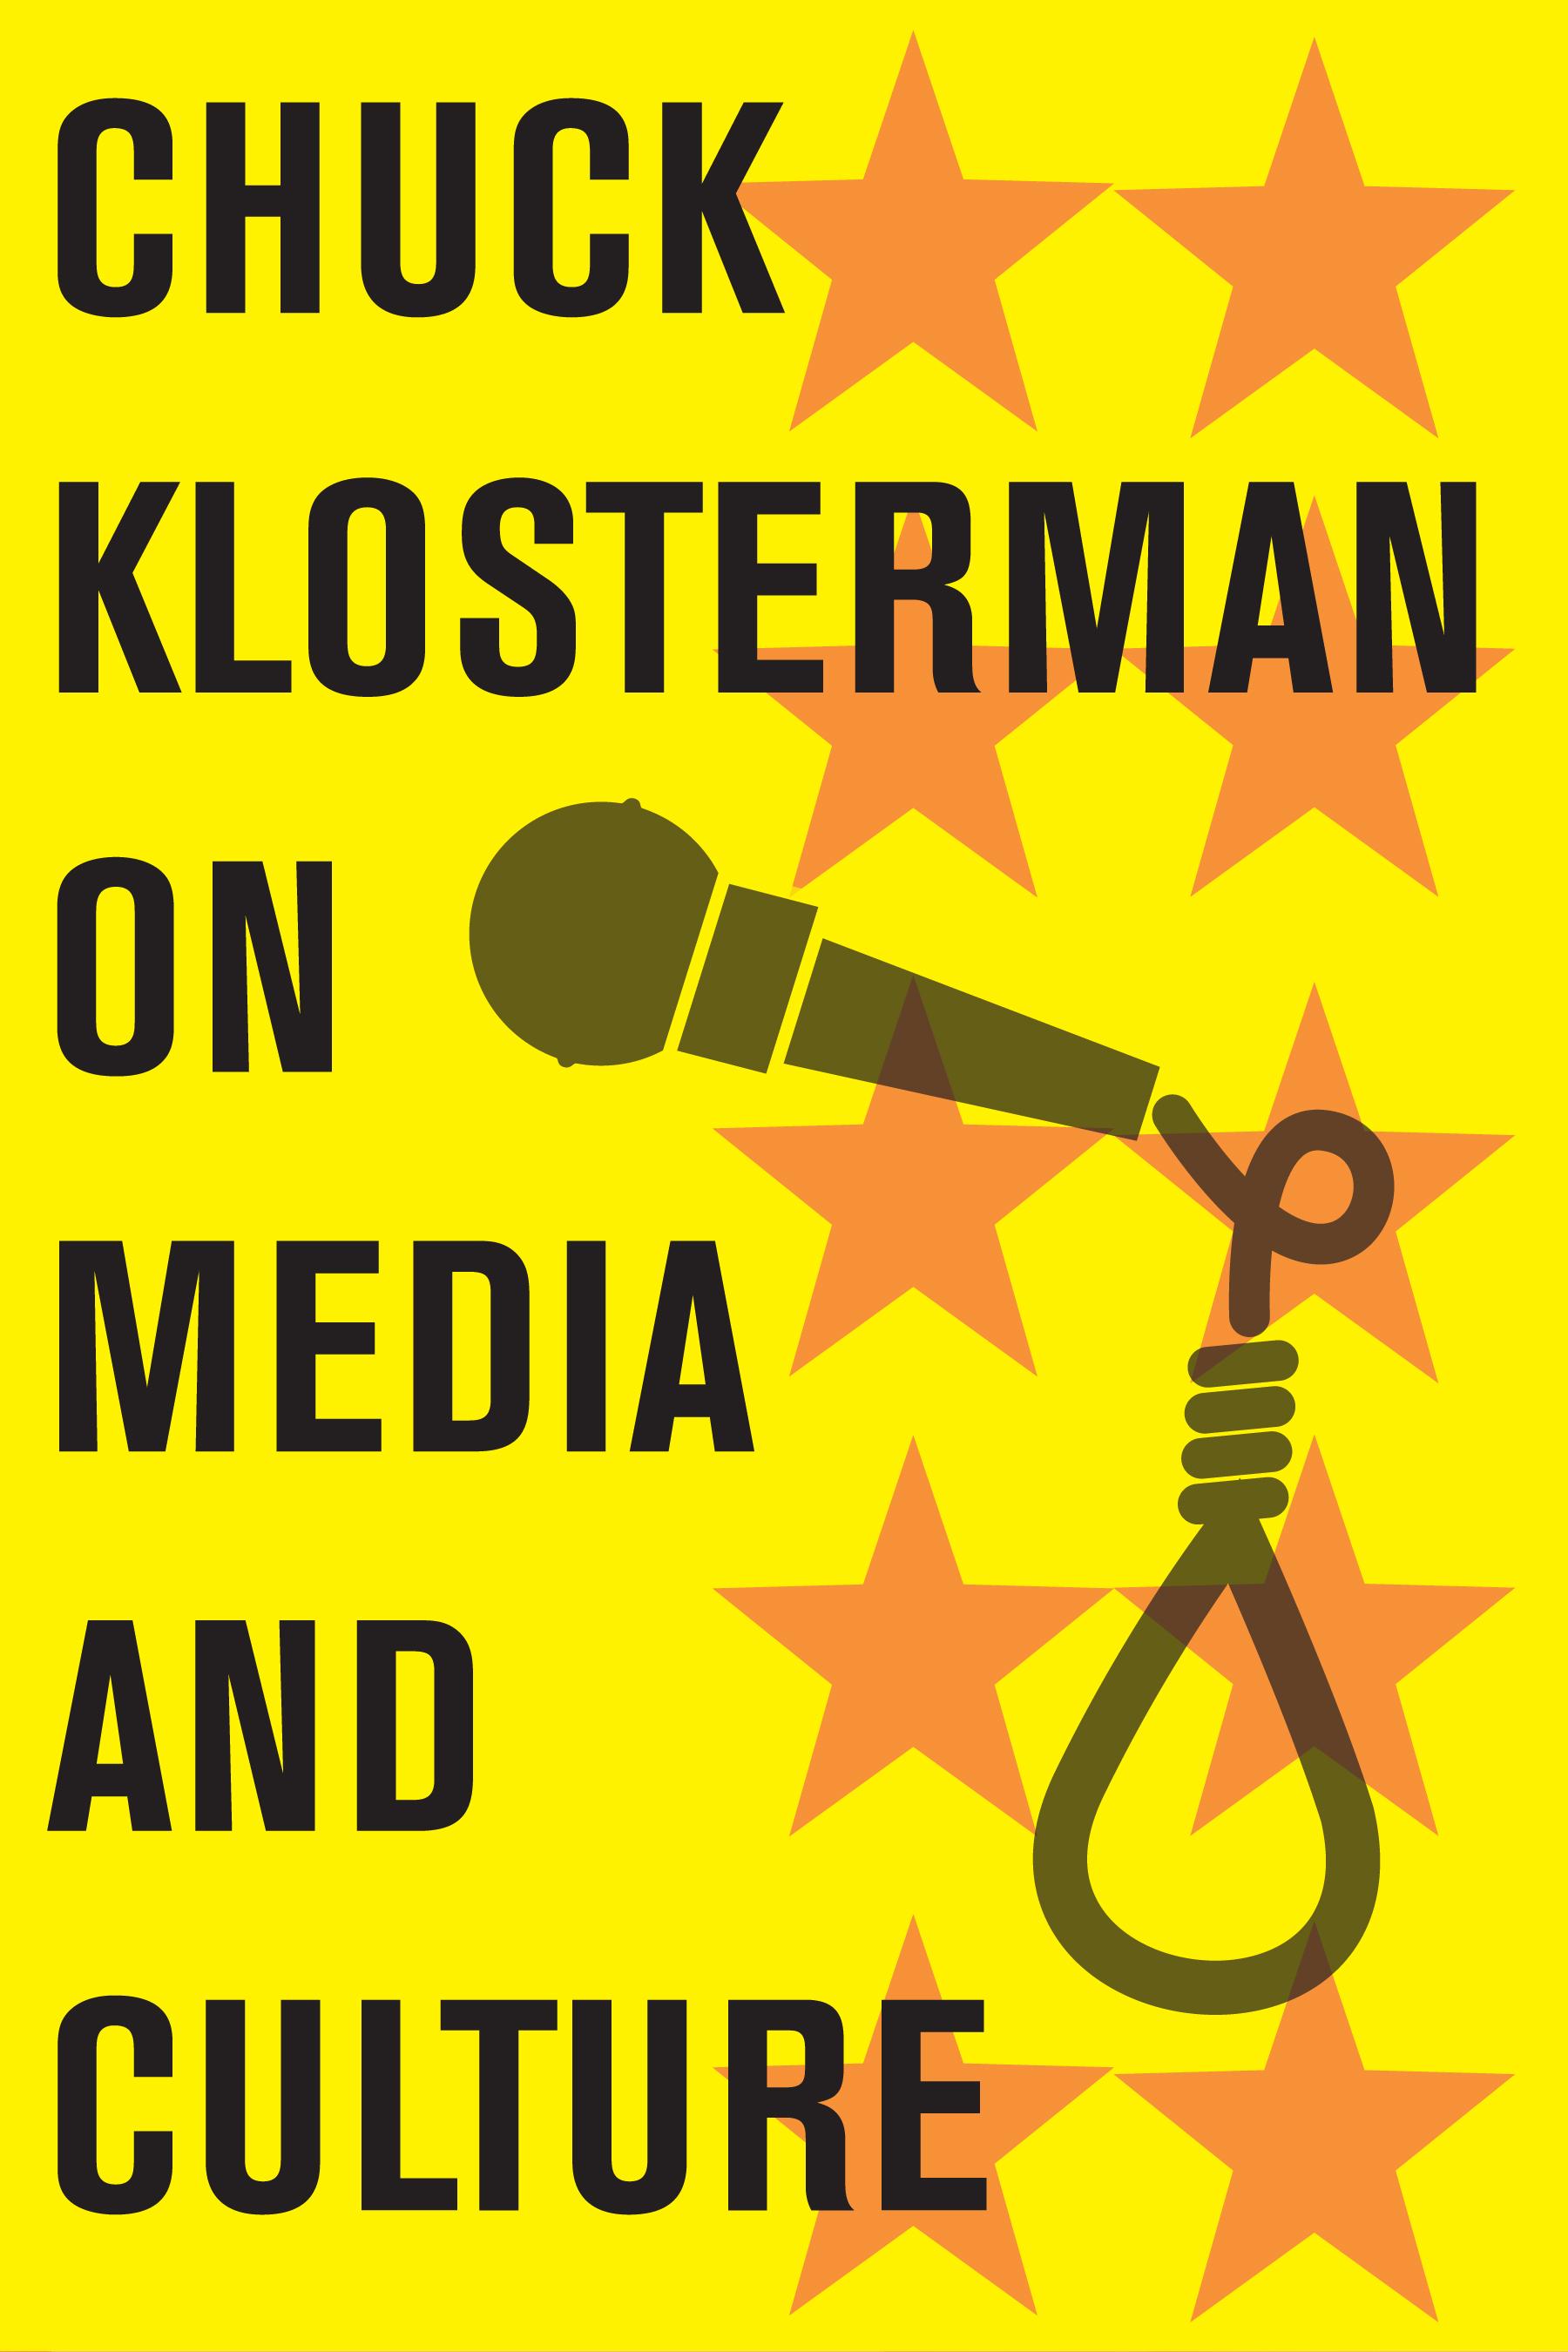 Chuck Klosterman, The (Sort of) Reformed Multi-Tasker